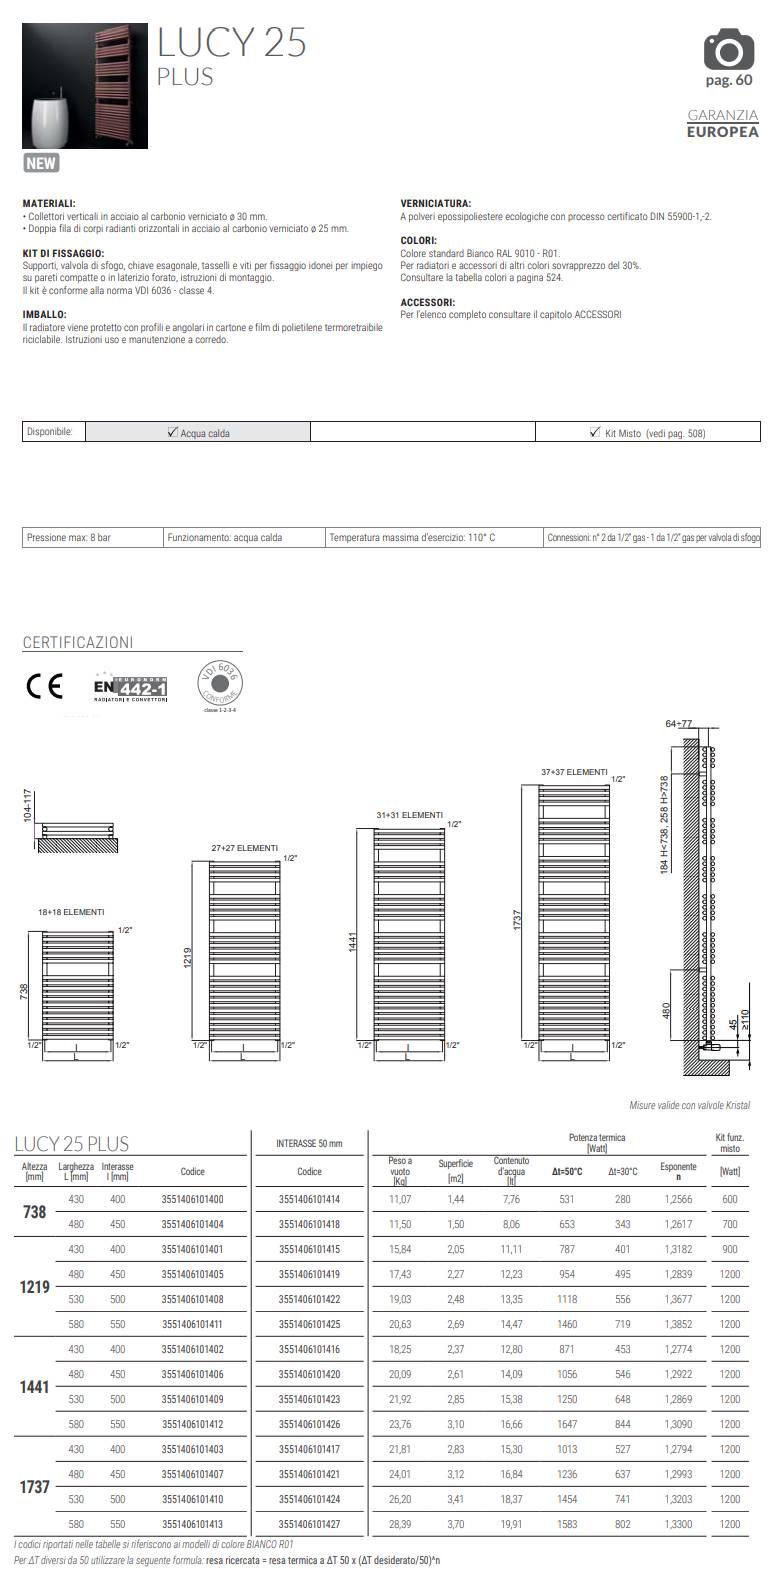 Blechtechnik-Handtuchwärmer-Lucy-25-plus-Cordivari